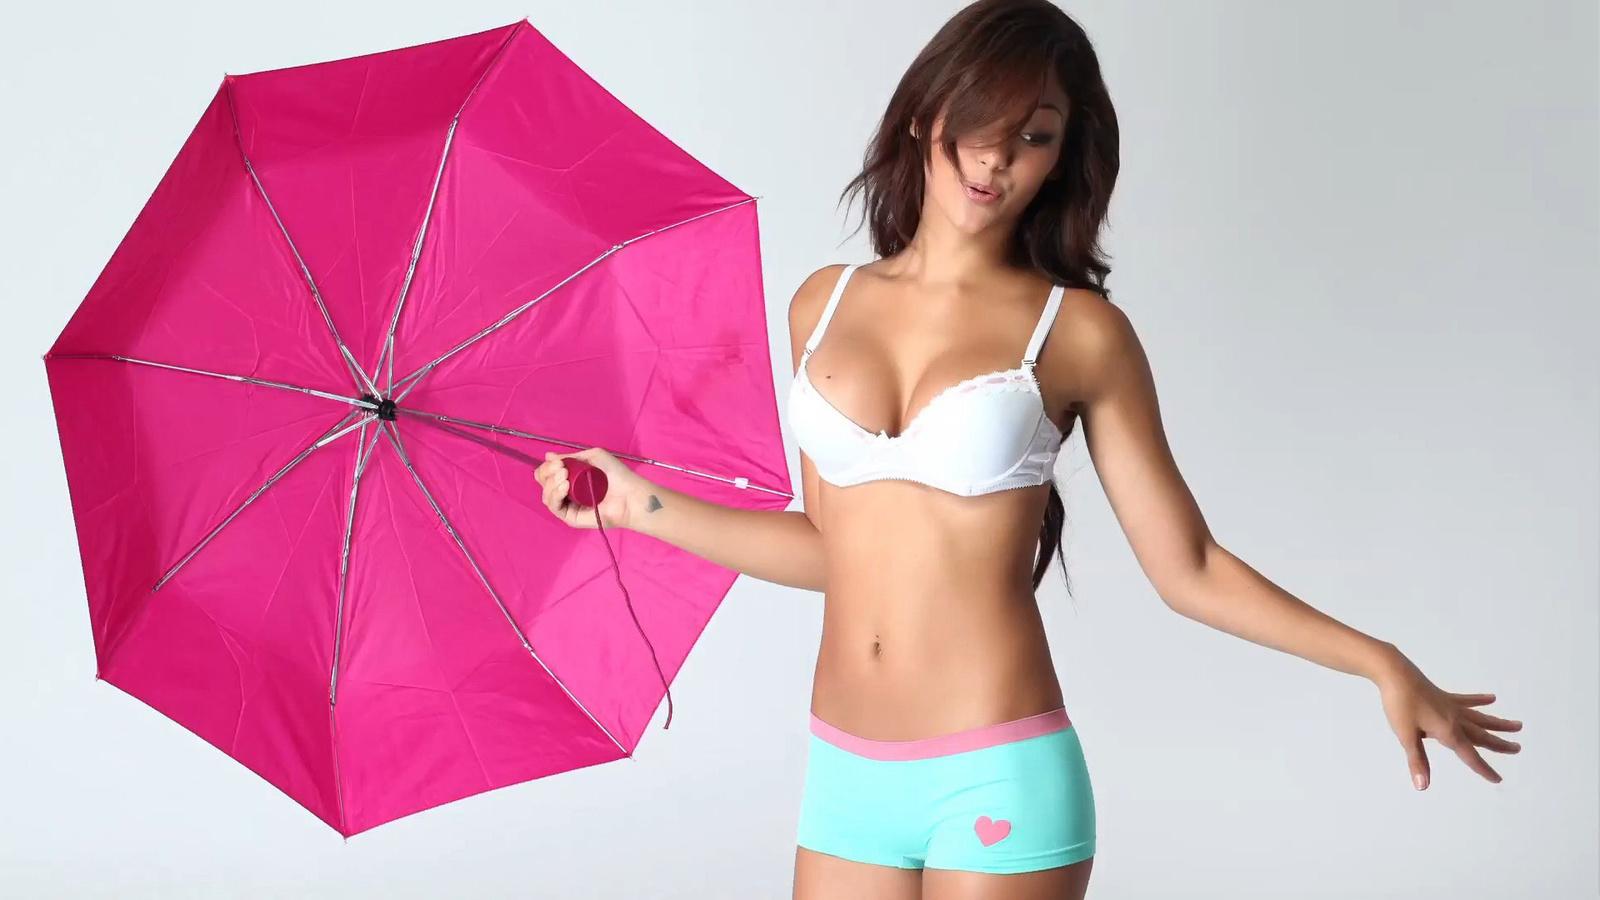 melanie iglesias, singer, model, bra, boxer, umbrella, cute